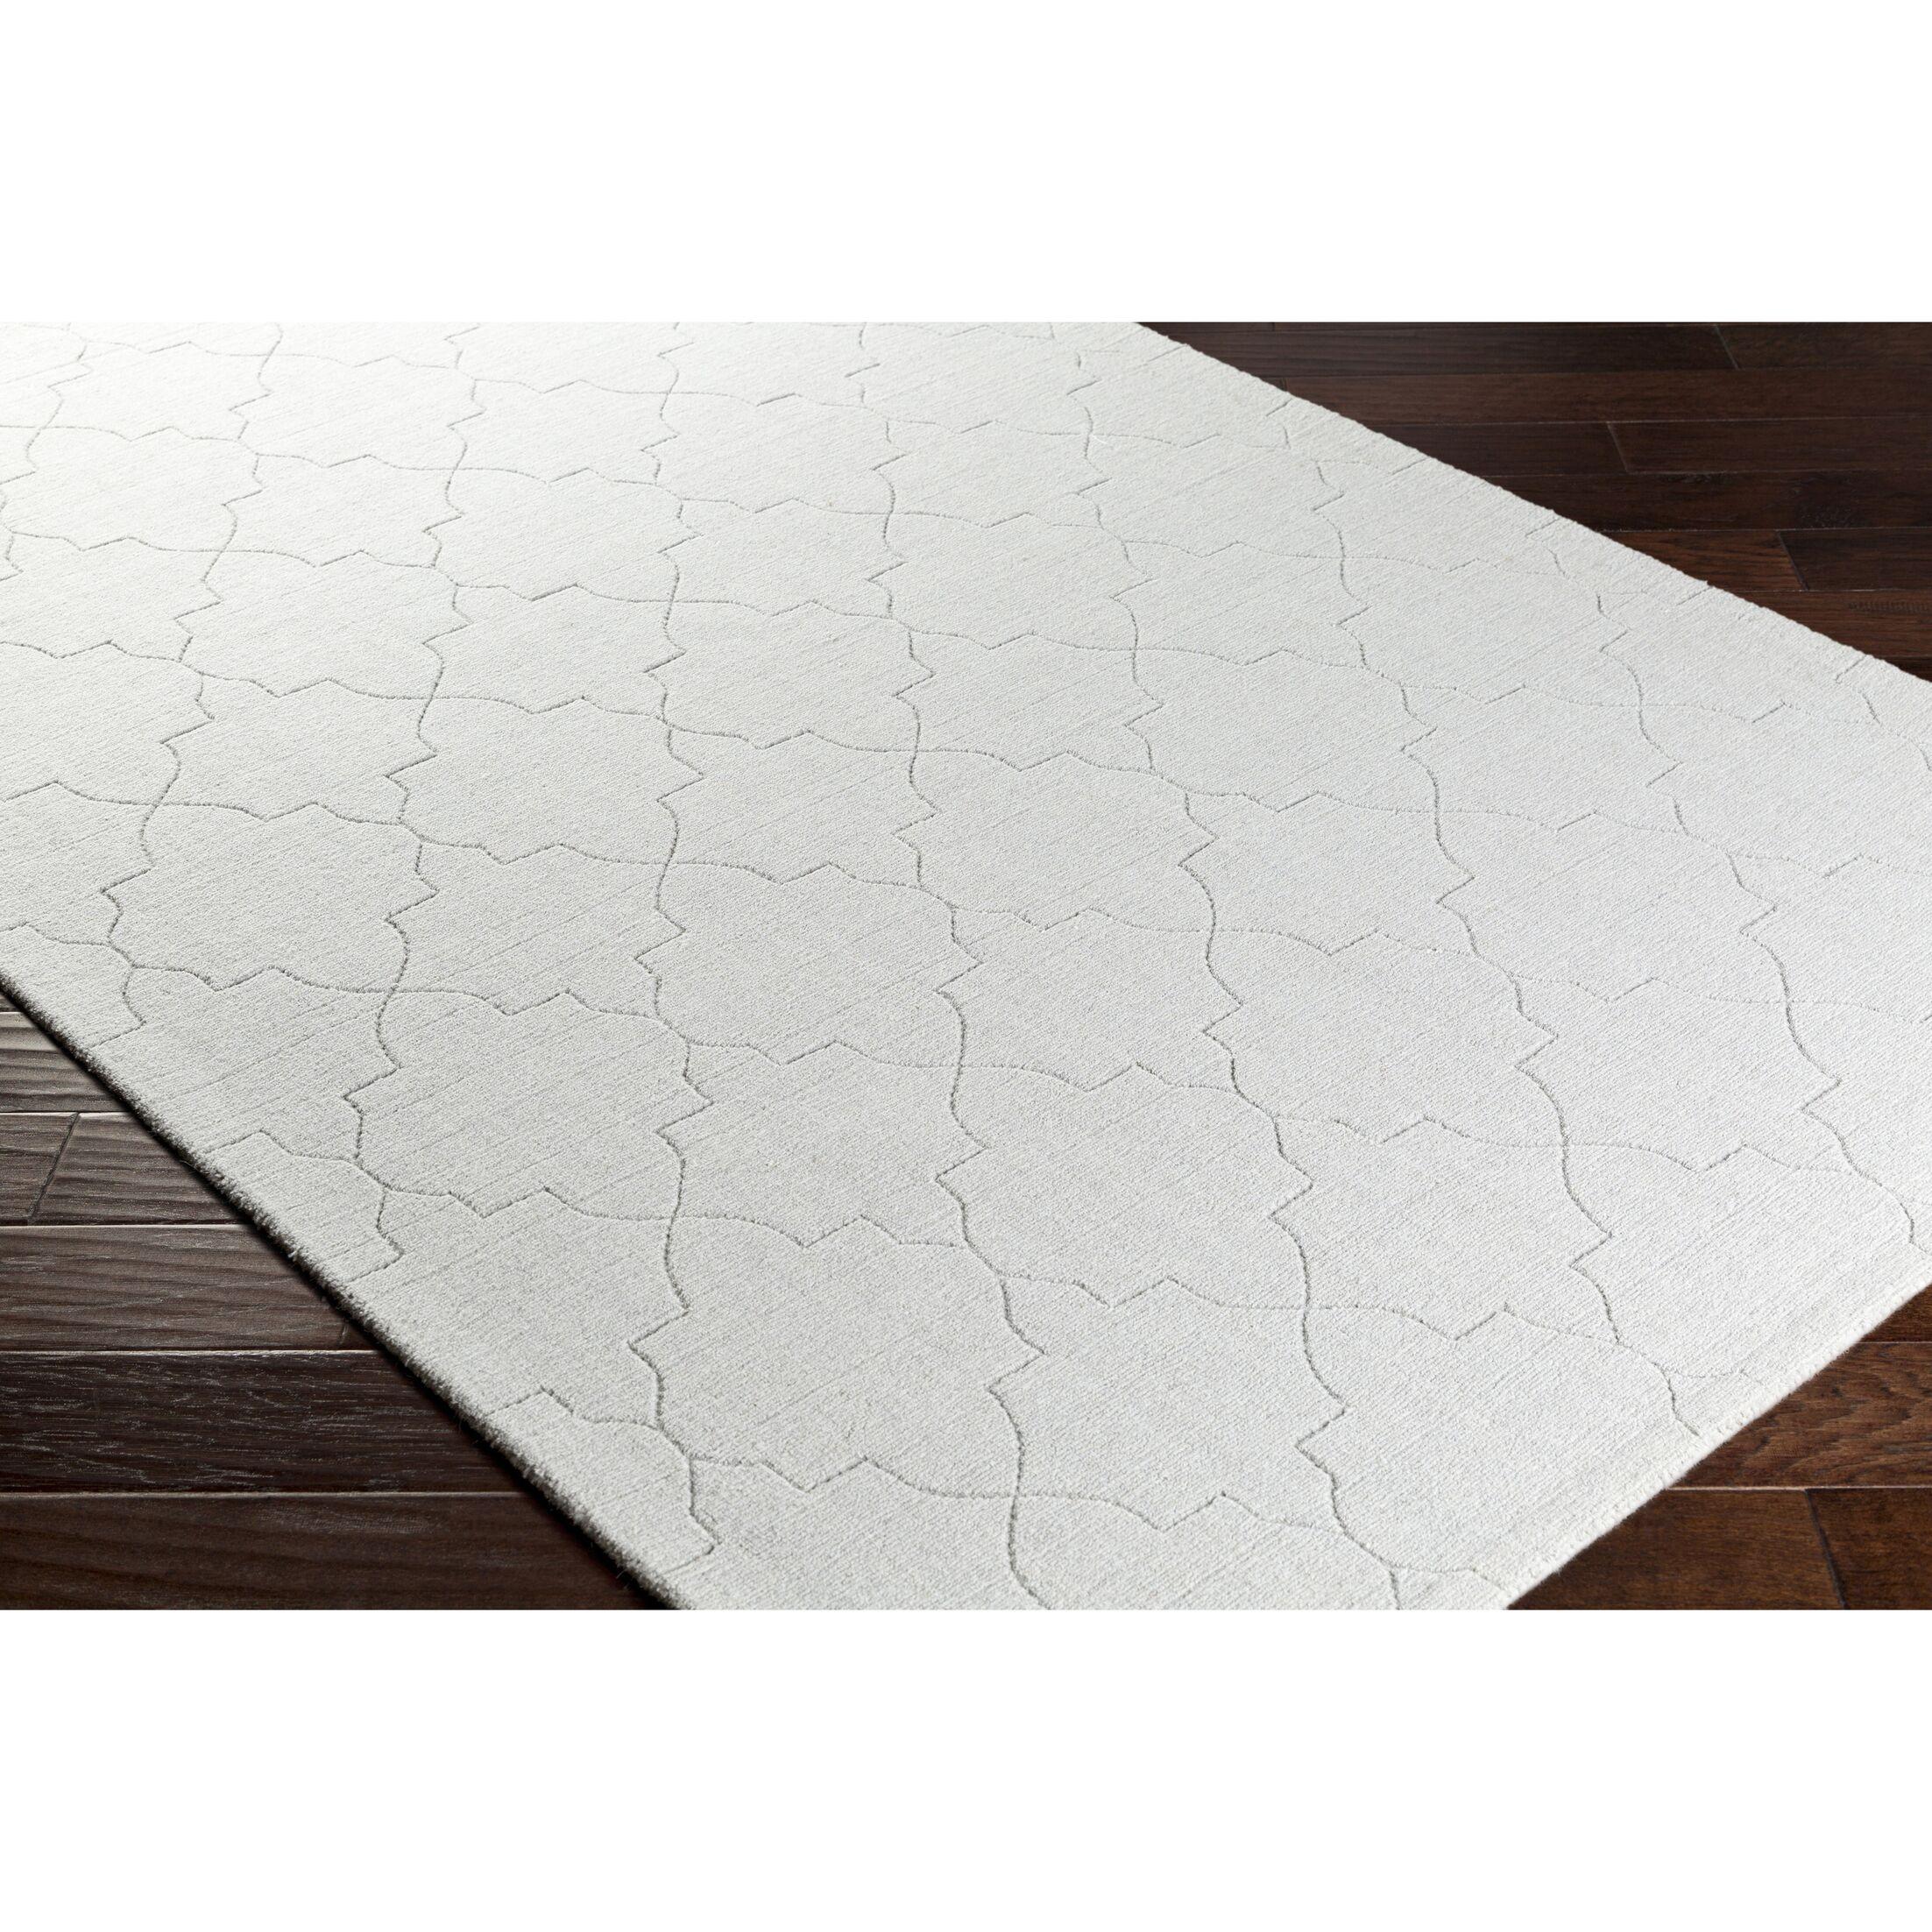 Swindell Hand-Loomed Gray Area Rug Rug Size: Rectangle 8' x 10'